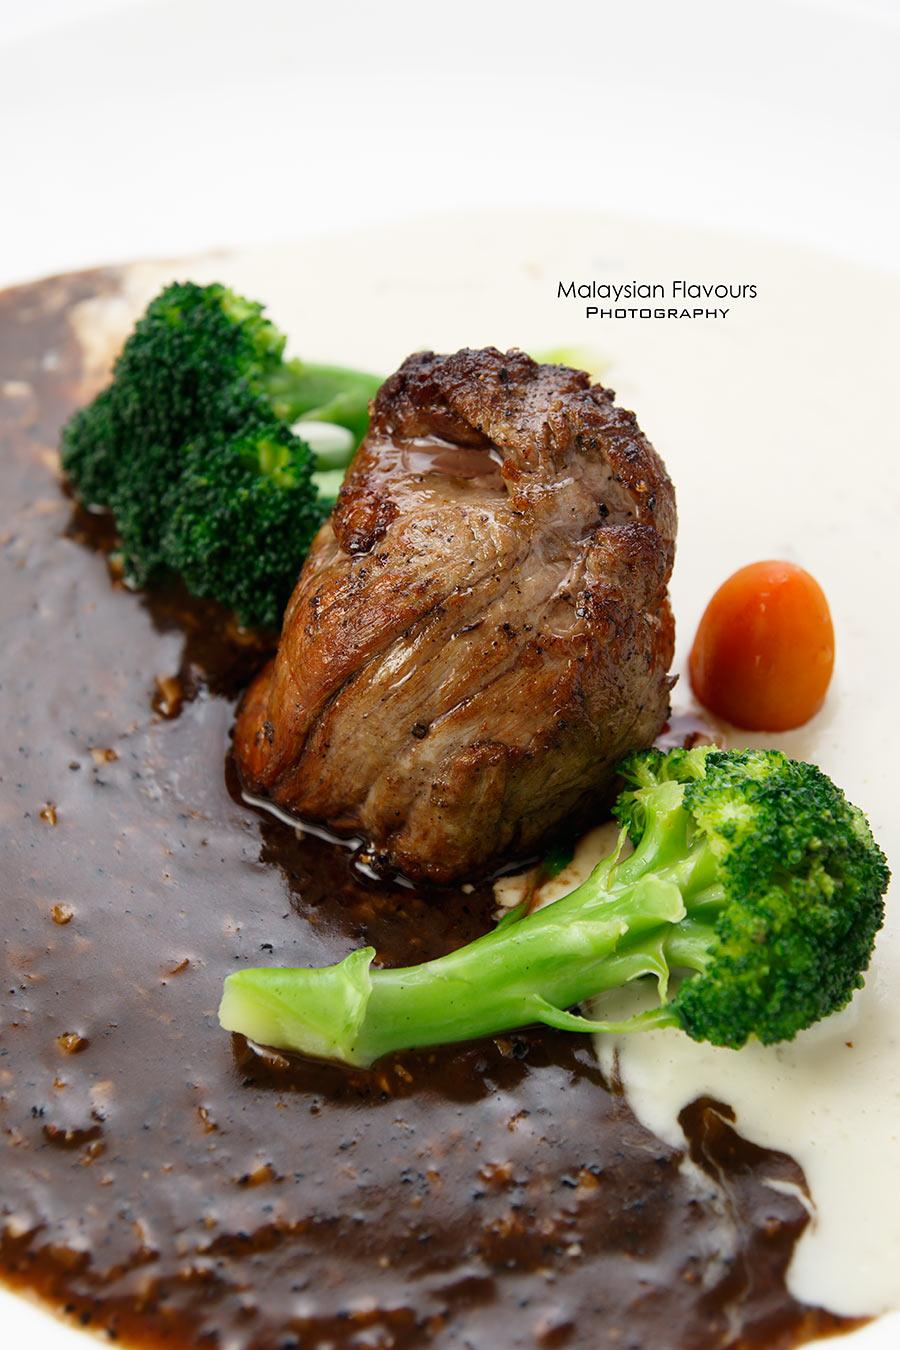 boathouse-ttdi-caramelized-roast-pork-with-garlic-cloves